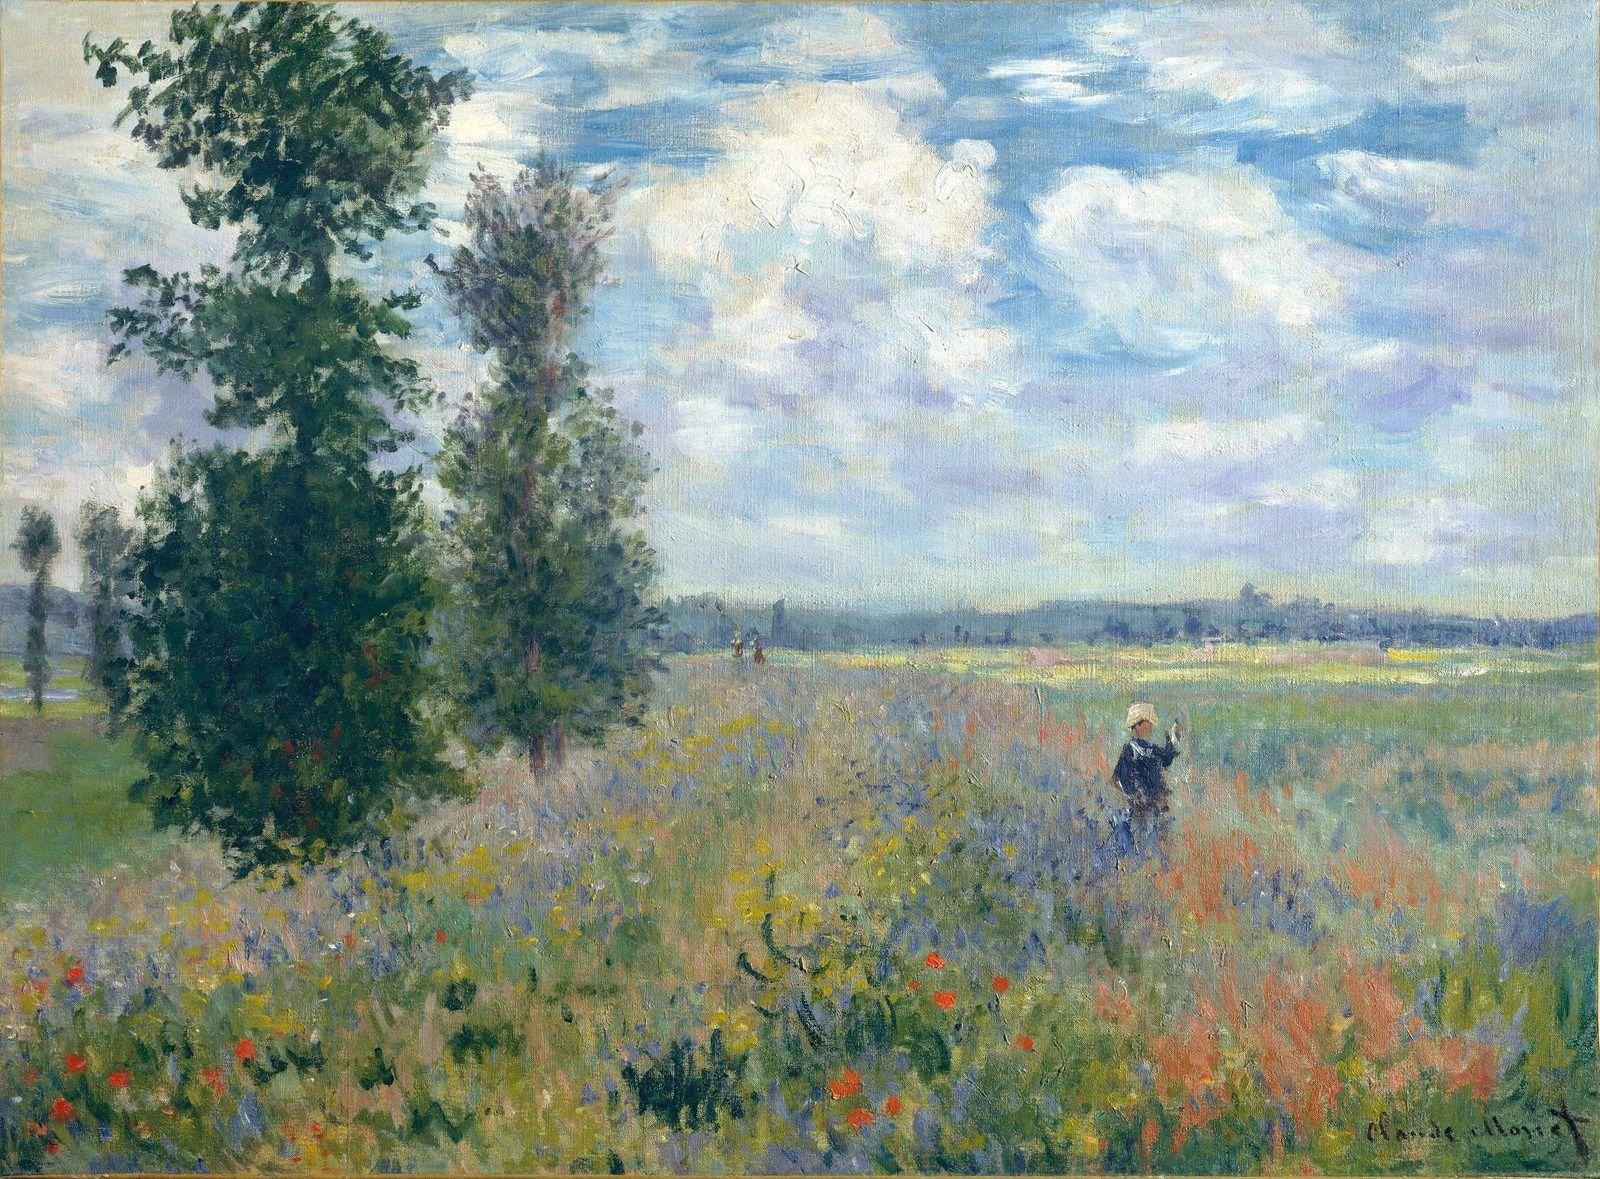 Poppy Field, Argenteuil, 1875 | Рисунки пейзажей, Импрессионист, Моне